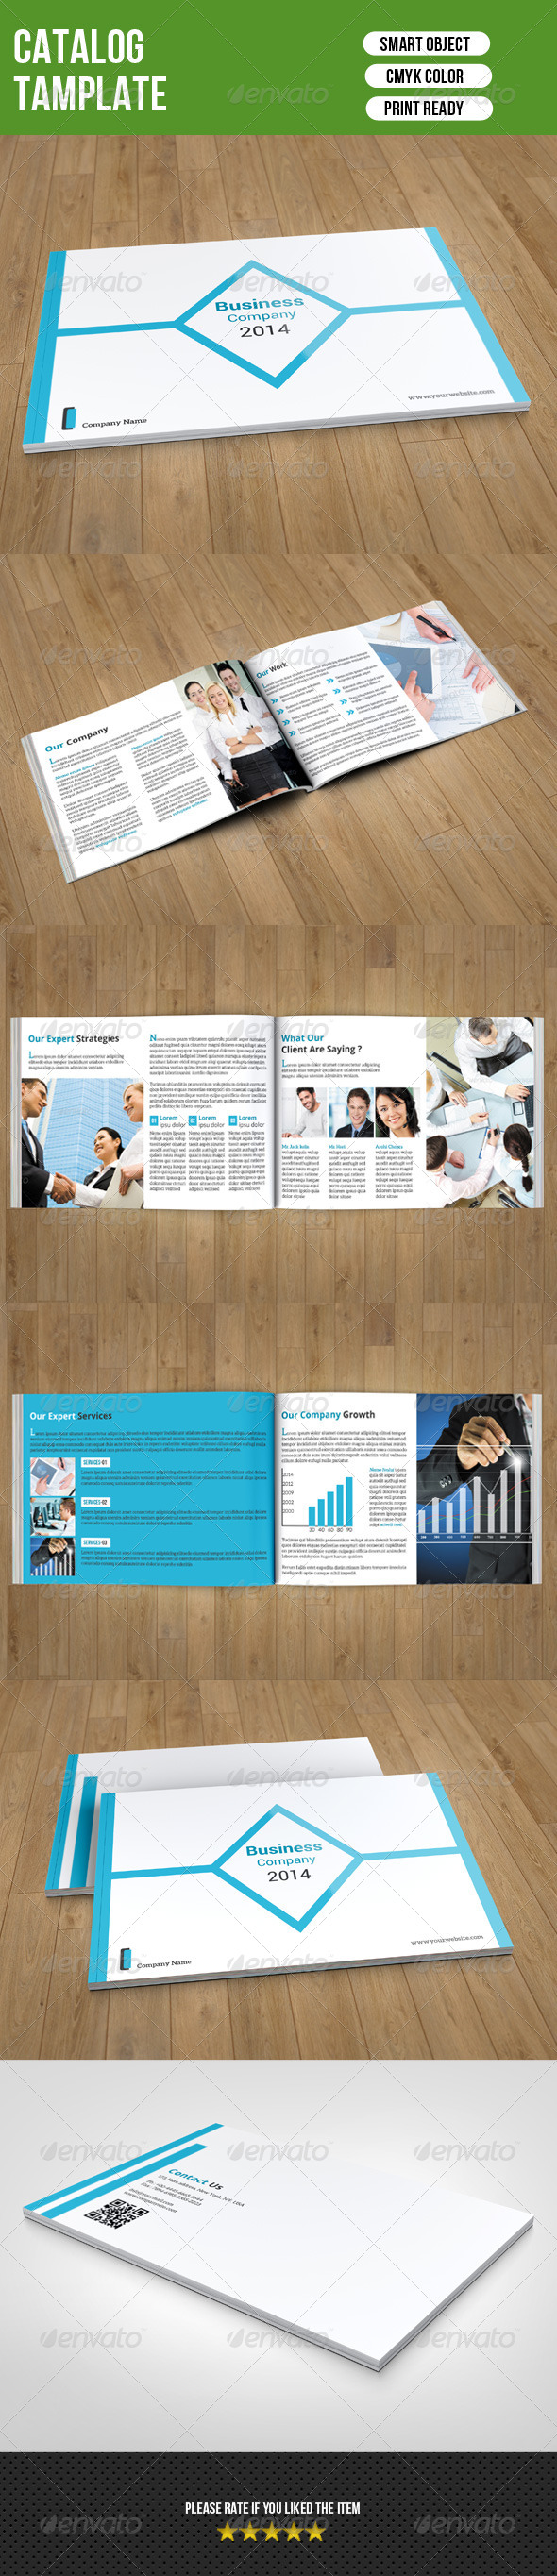 GraphicRiver Business Catalog Template 7673929